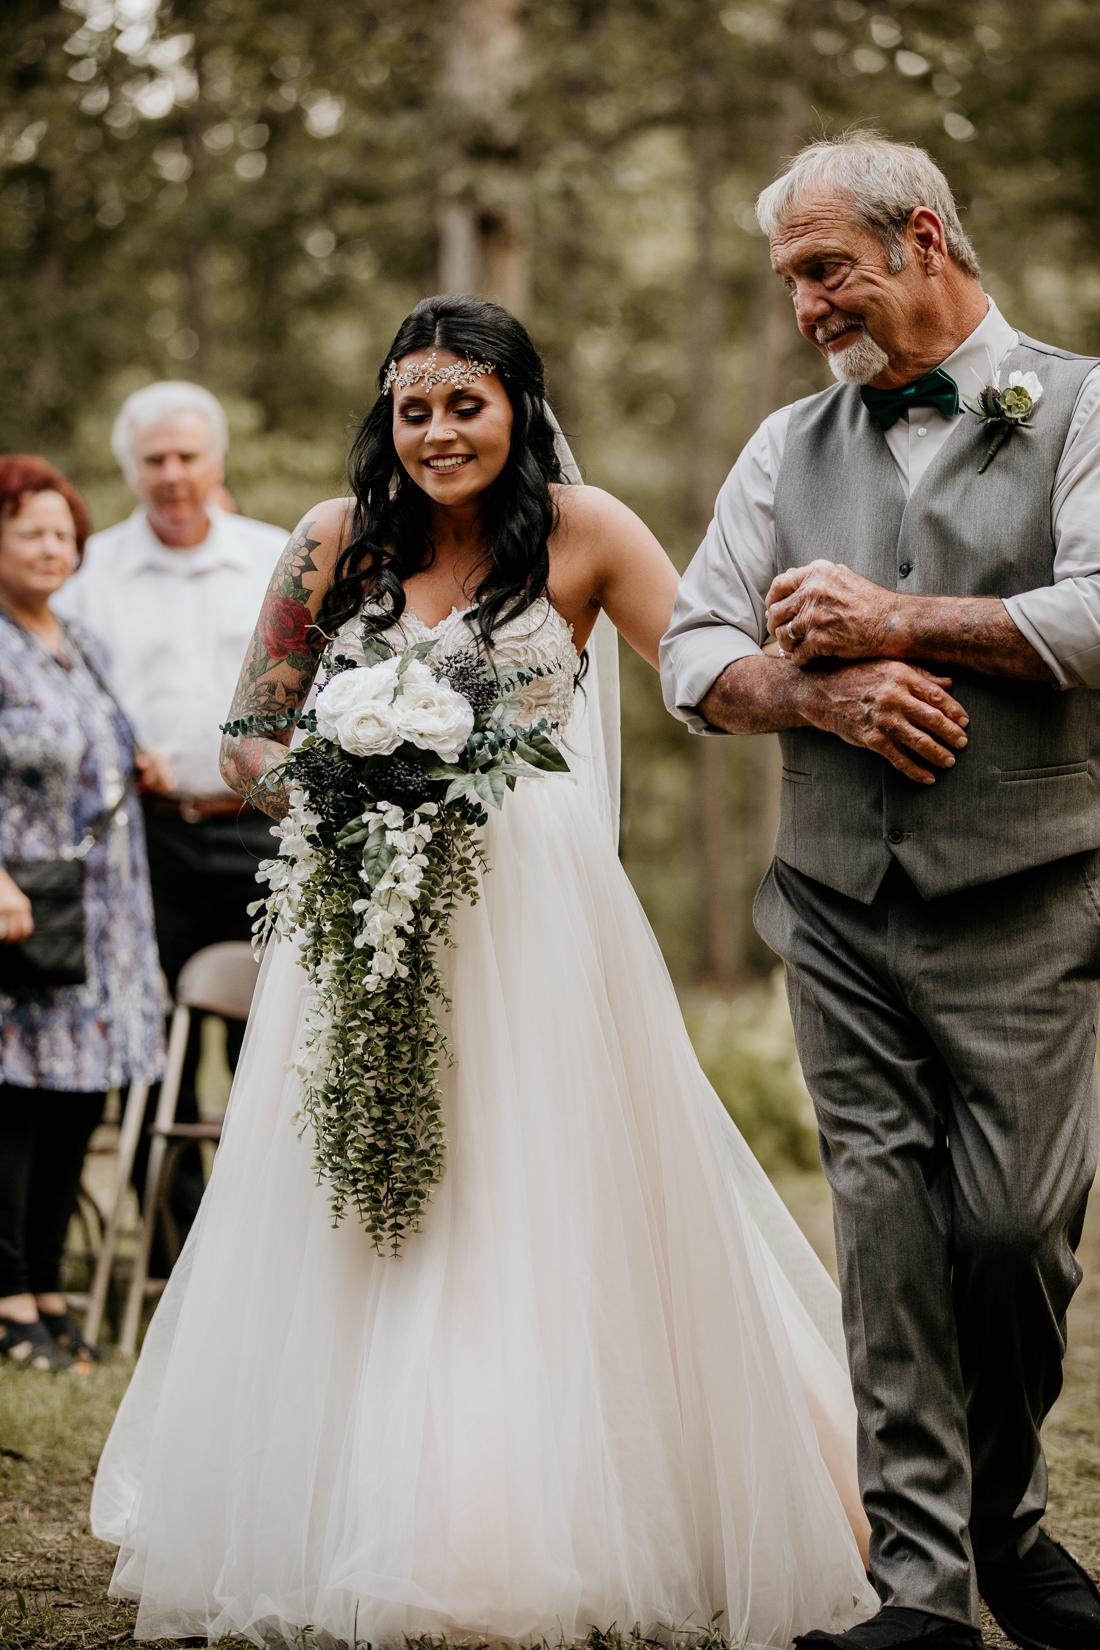 olivia_zay_wedding_09_2018-9621.jpg